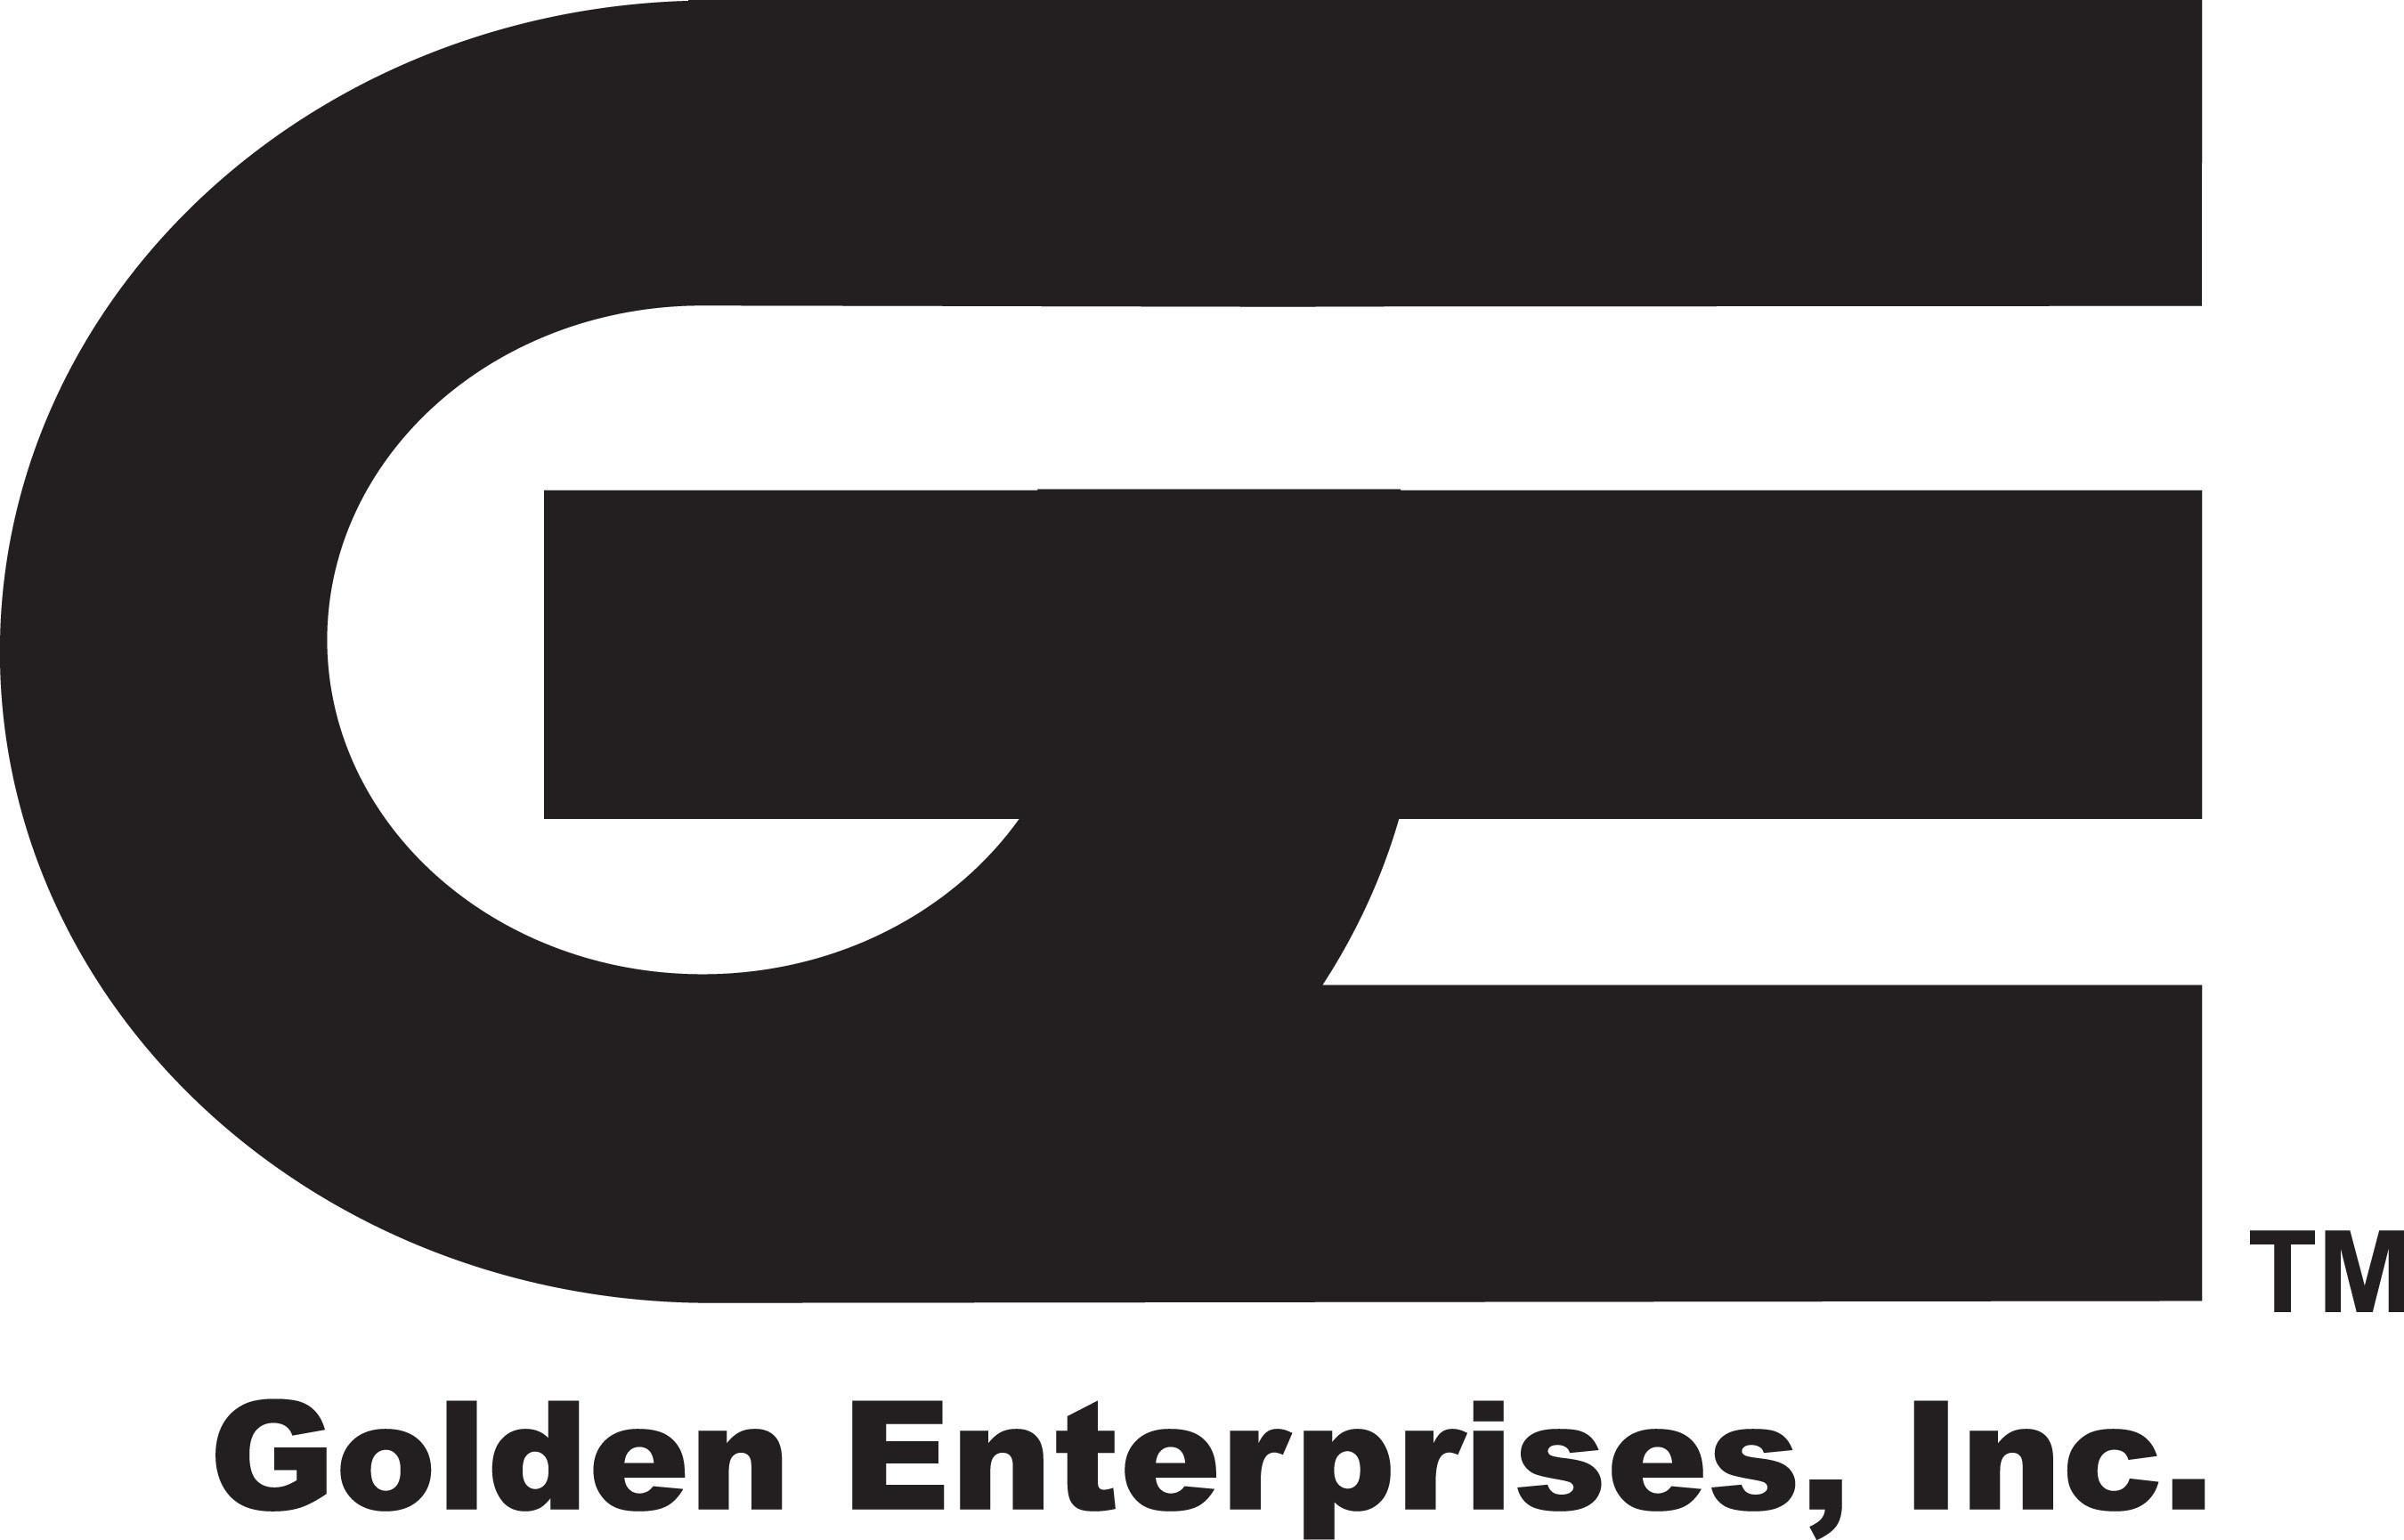 Golden Enterprises logo